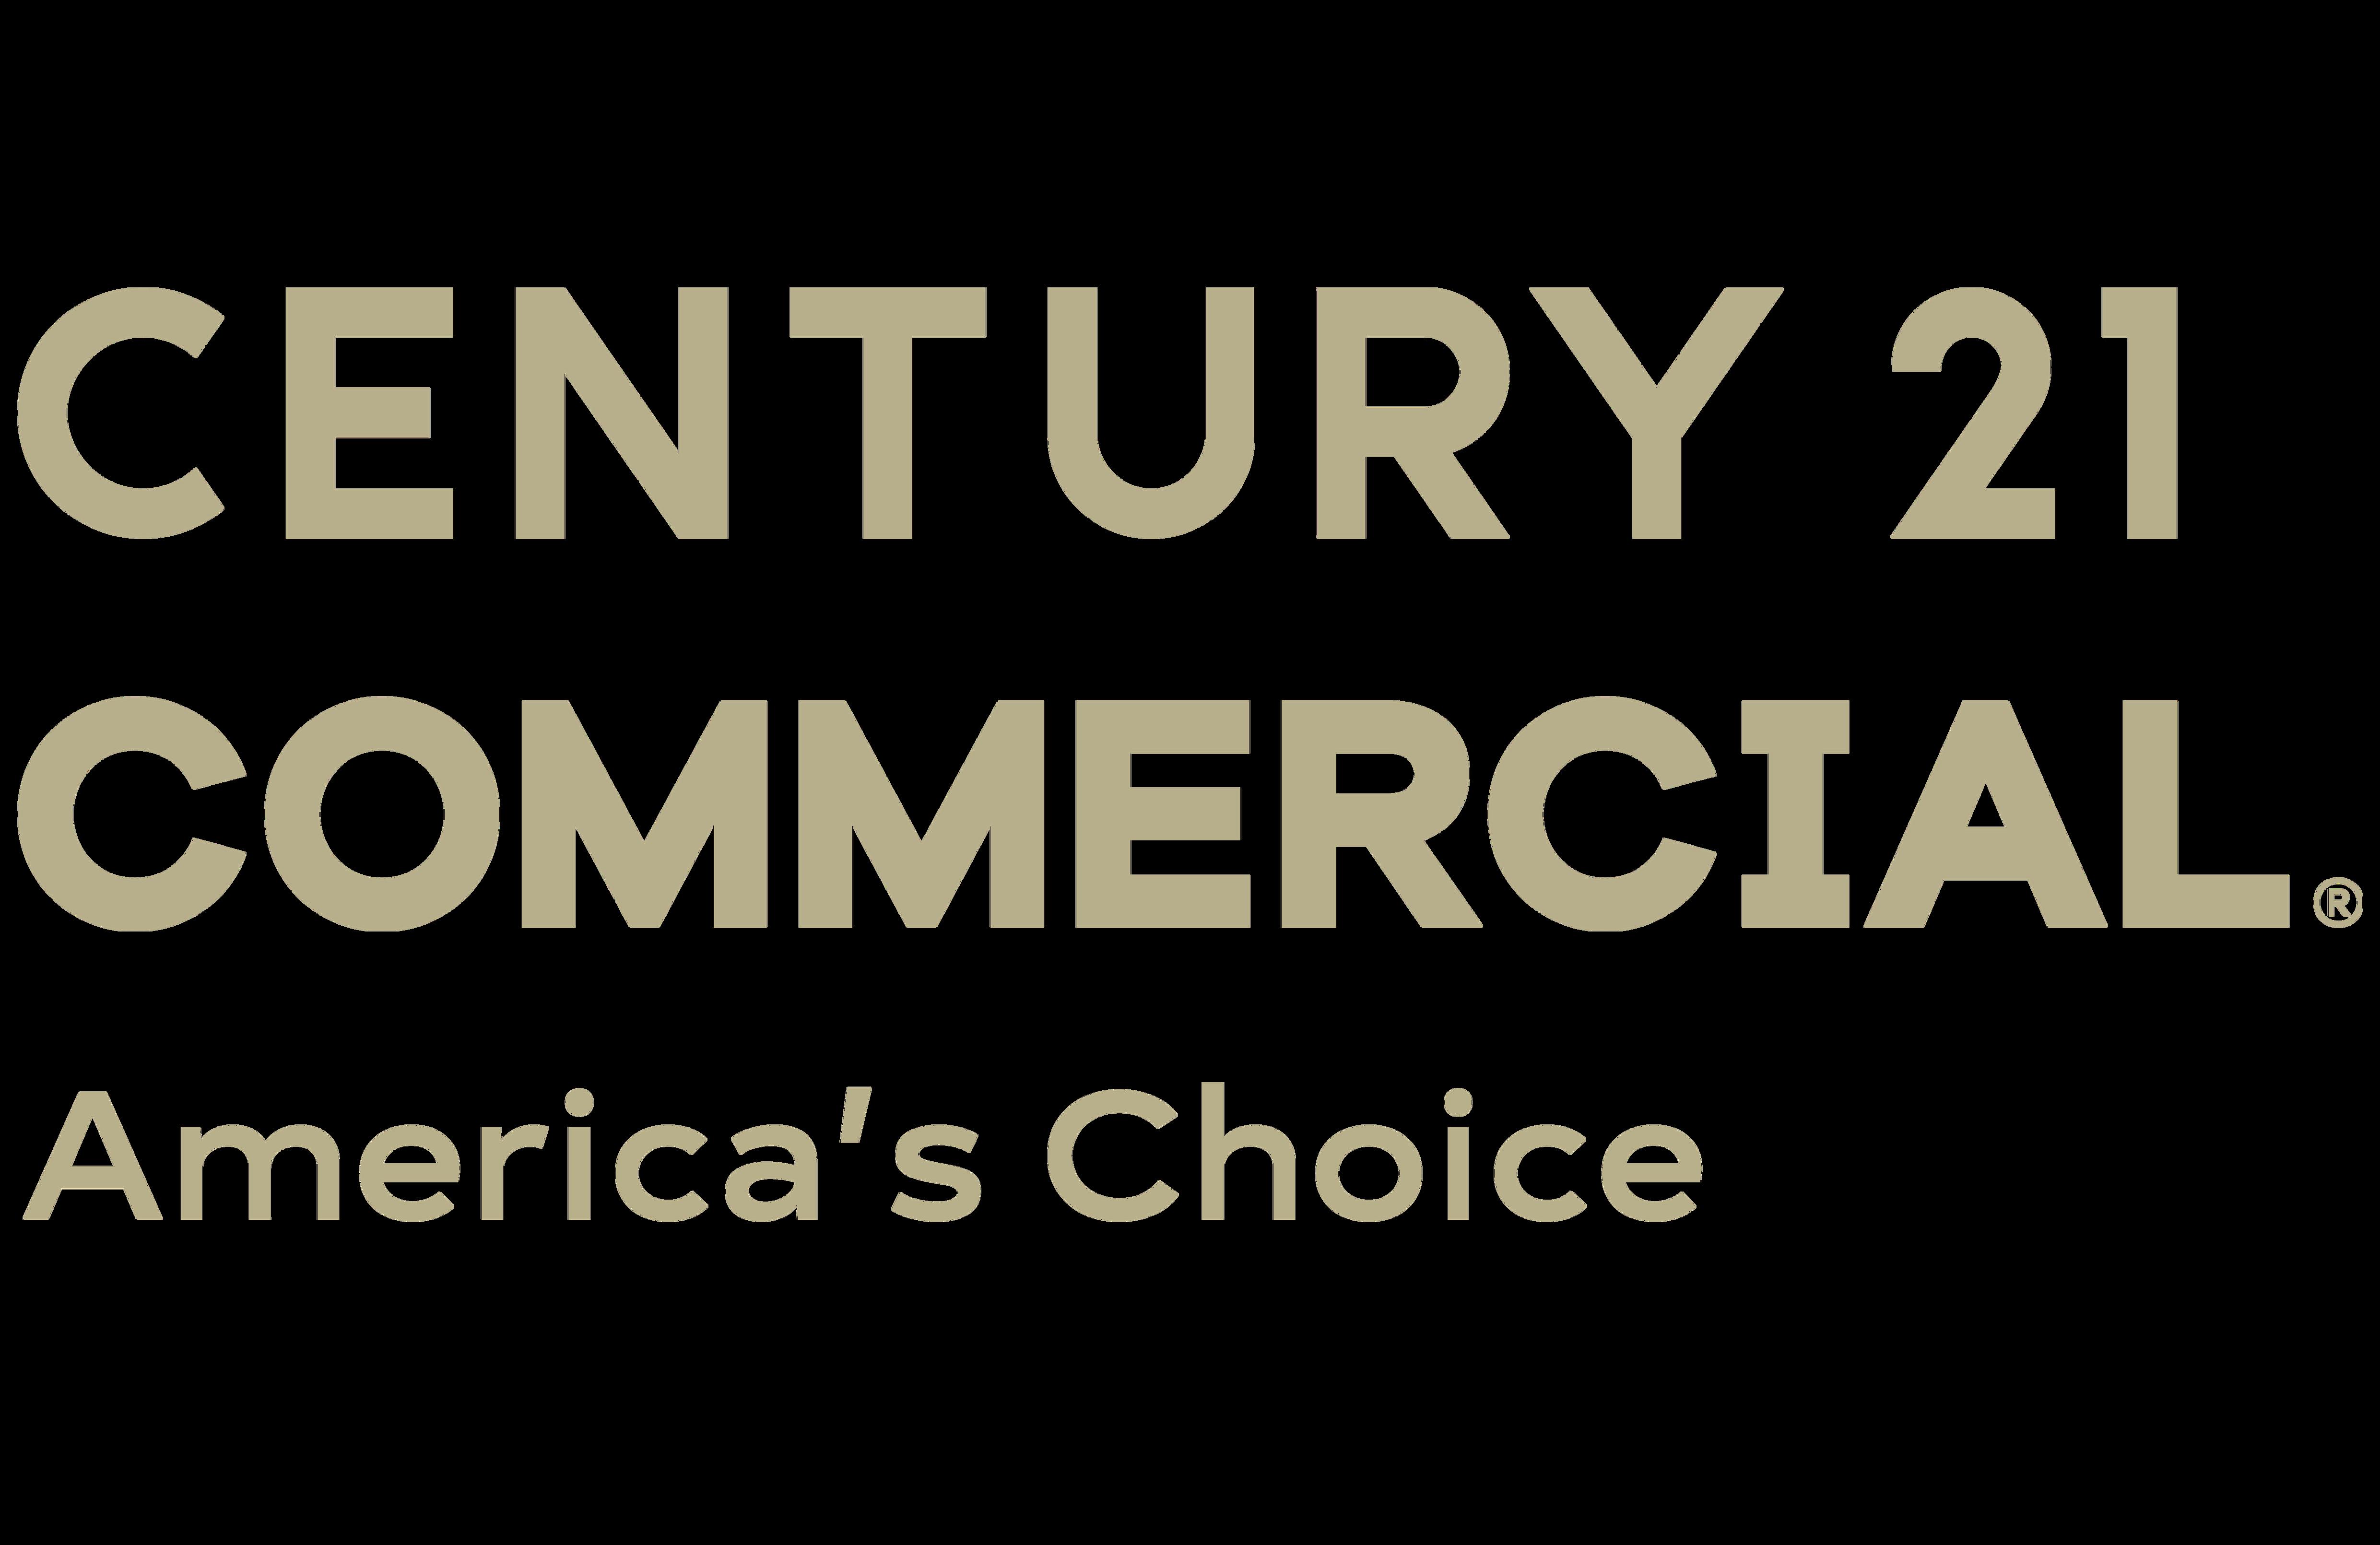 CENTURY 21 America's Choice